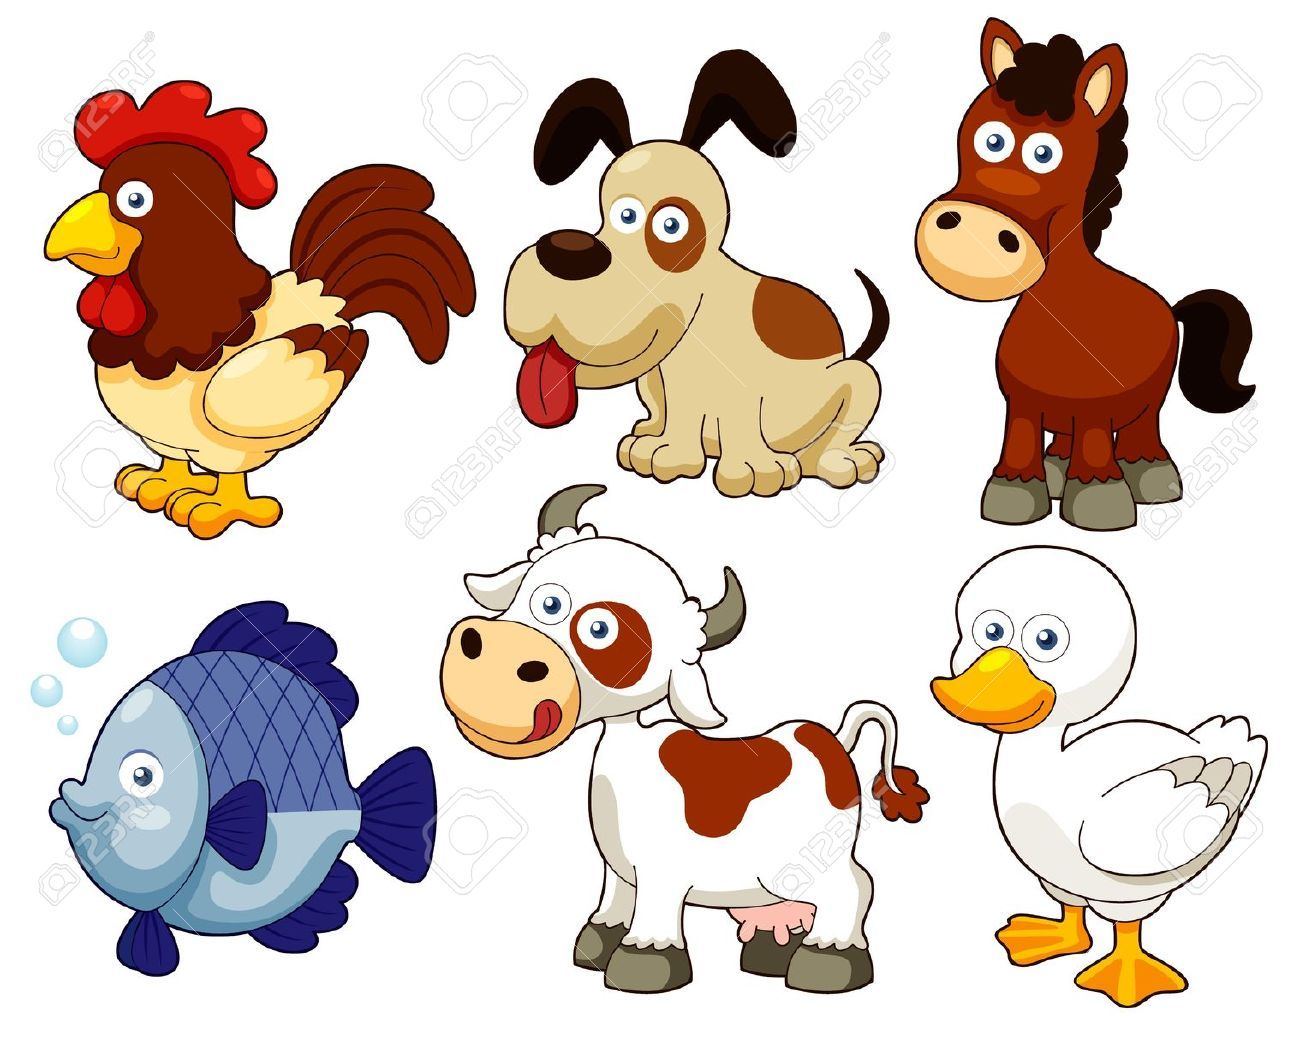 Pin De Adriana Lazo En Knutselen Schilderen Fichas De Animales Animales Domesticos Animados Animales Dibujos Animados